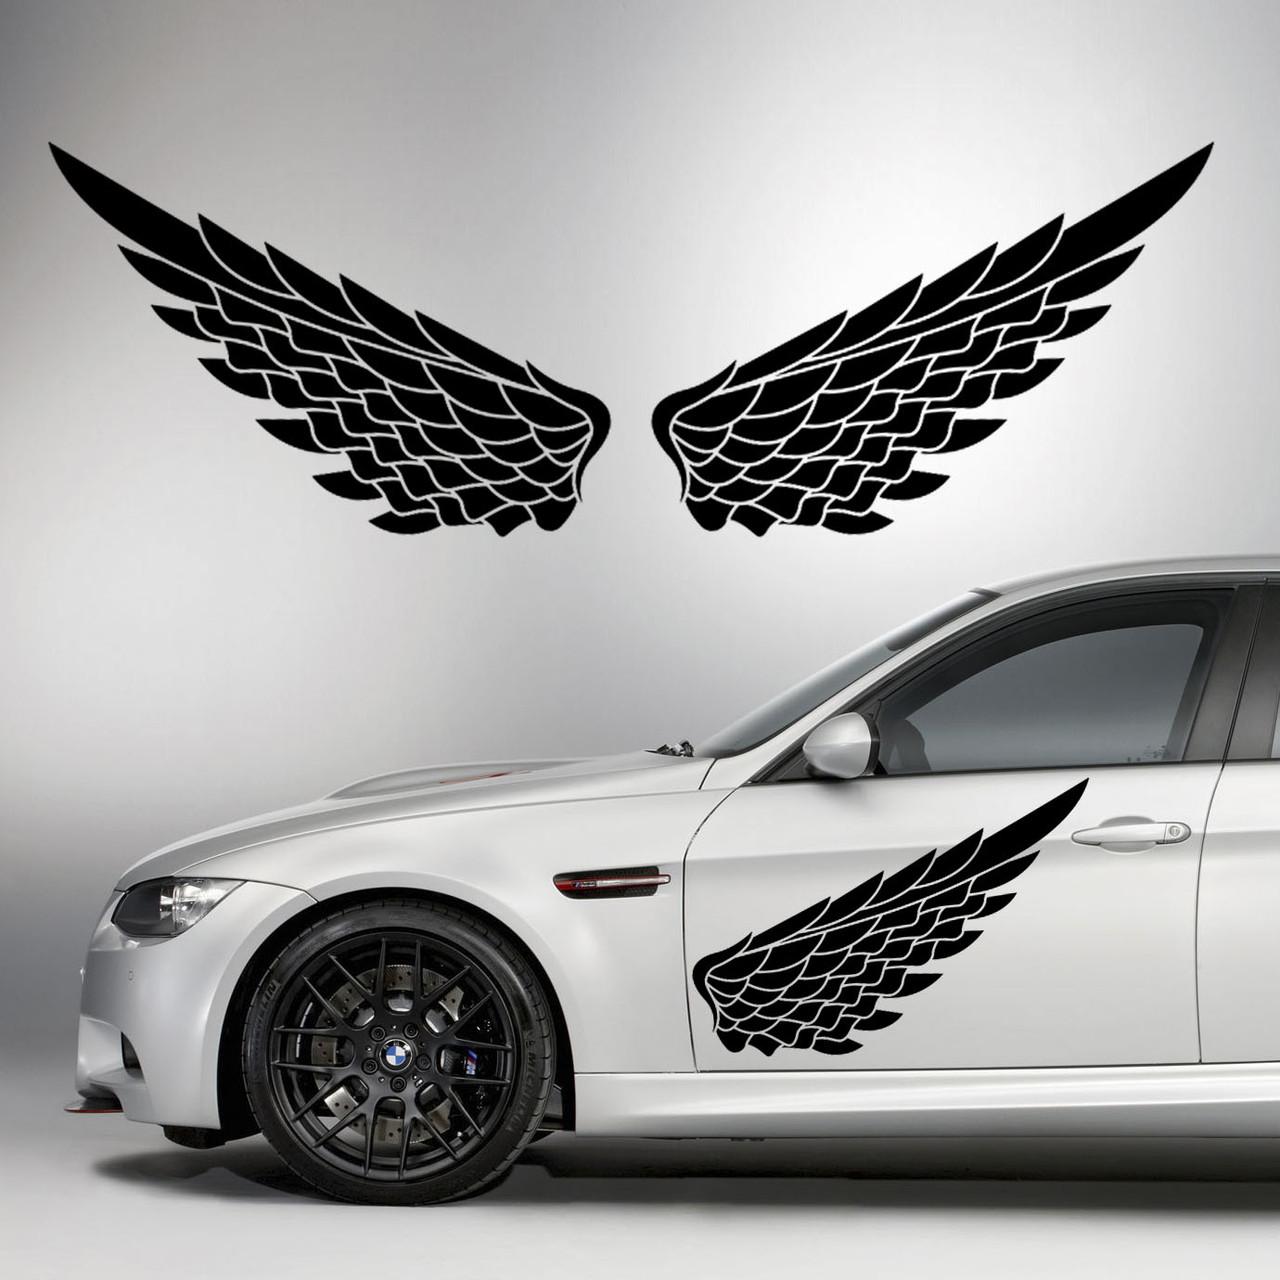 Наклейки КРЫЛЬЯ. Наклейка на авто крылья ангела на двери, на кузов, на капот. Размер 82х28см. Цена за 2шт.!